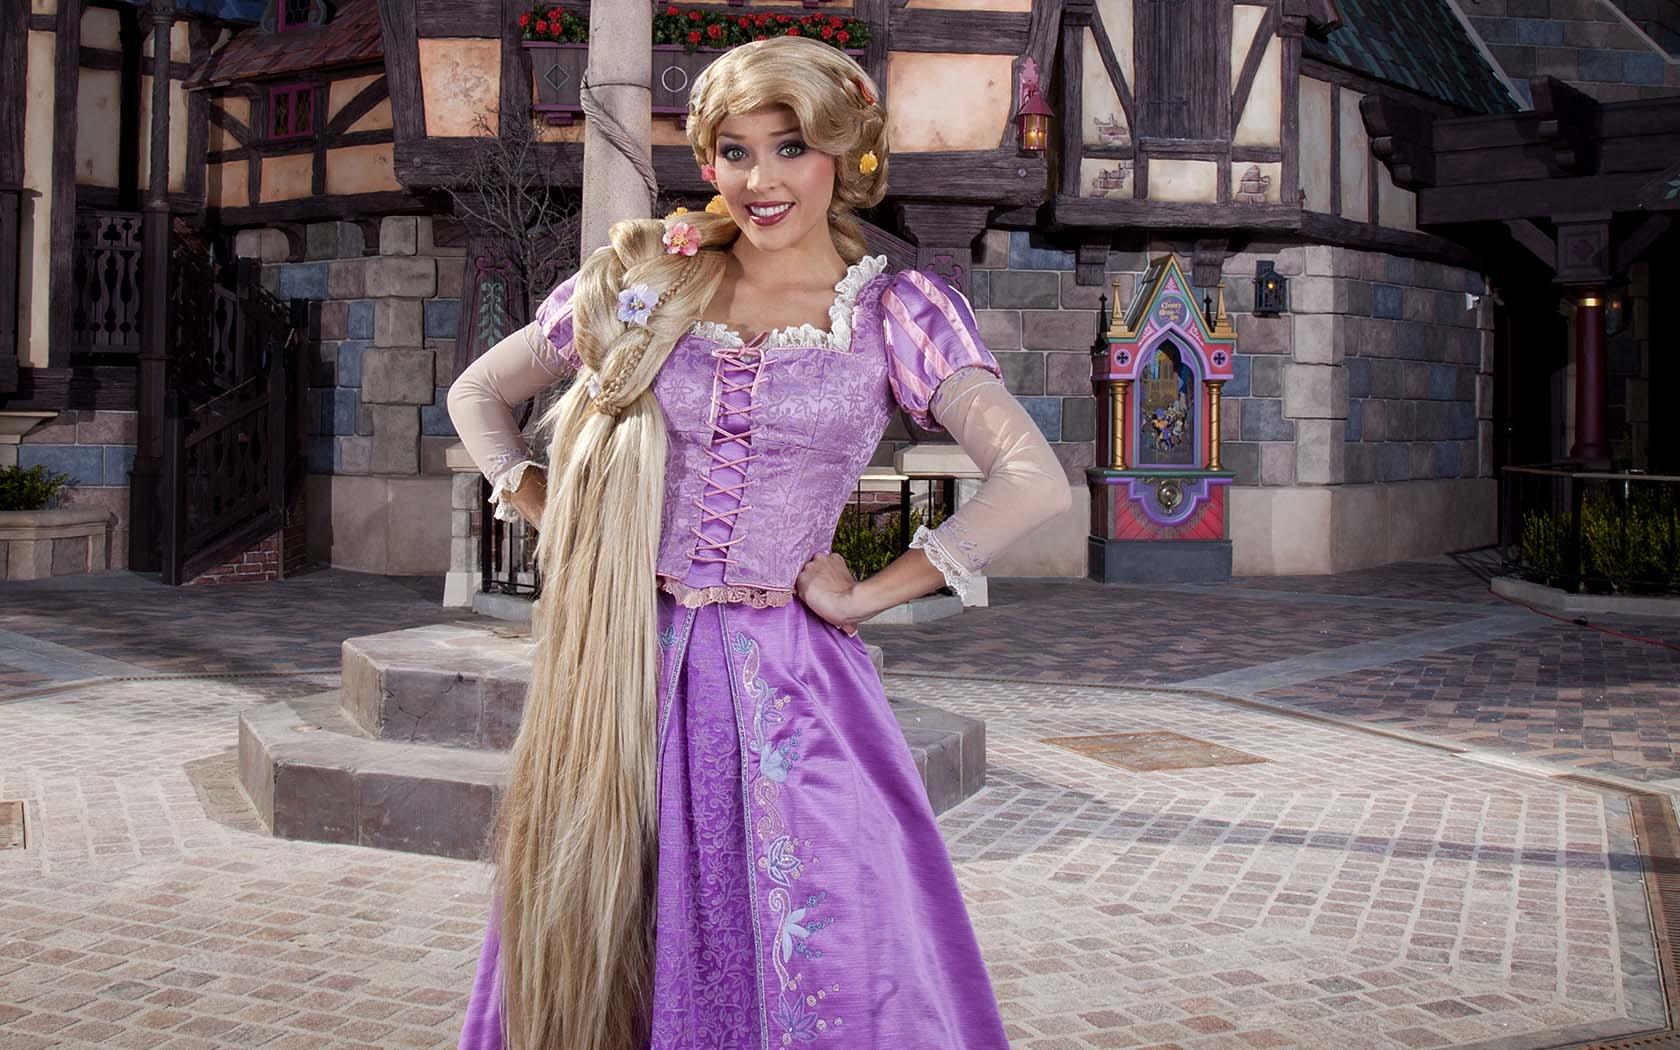 Disneyland Paris Is Hiring For Princesses And Princes